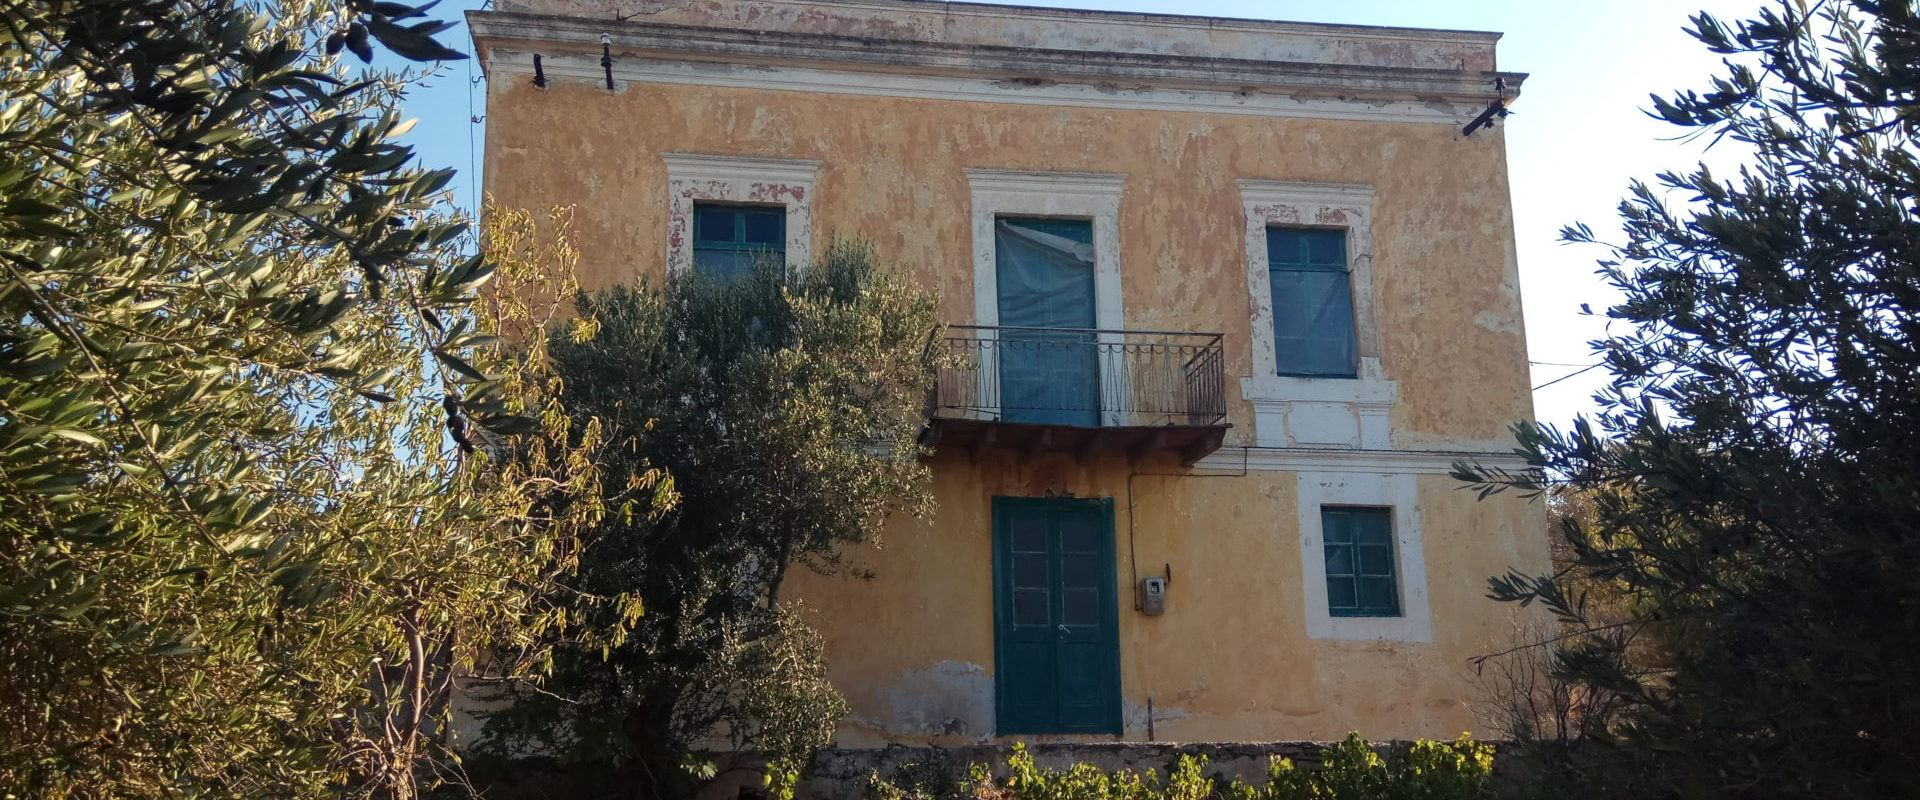 Maison Neoclassique in Leros L593